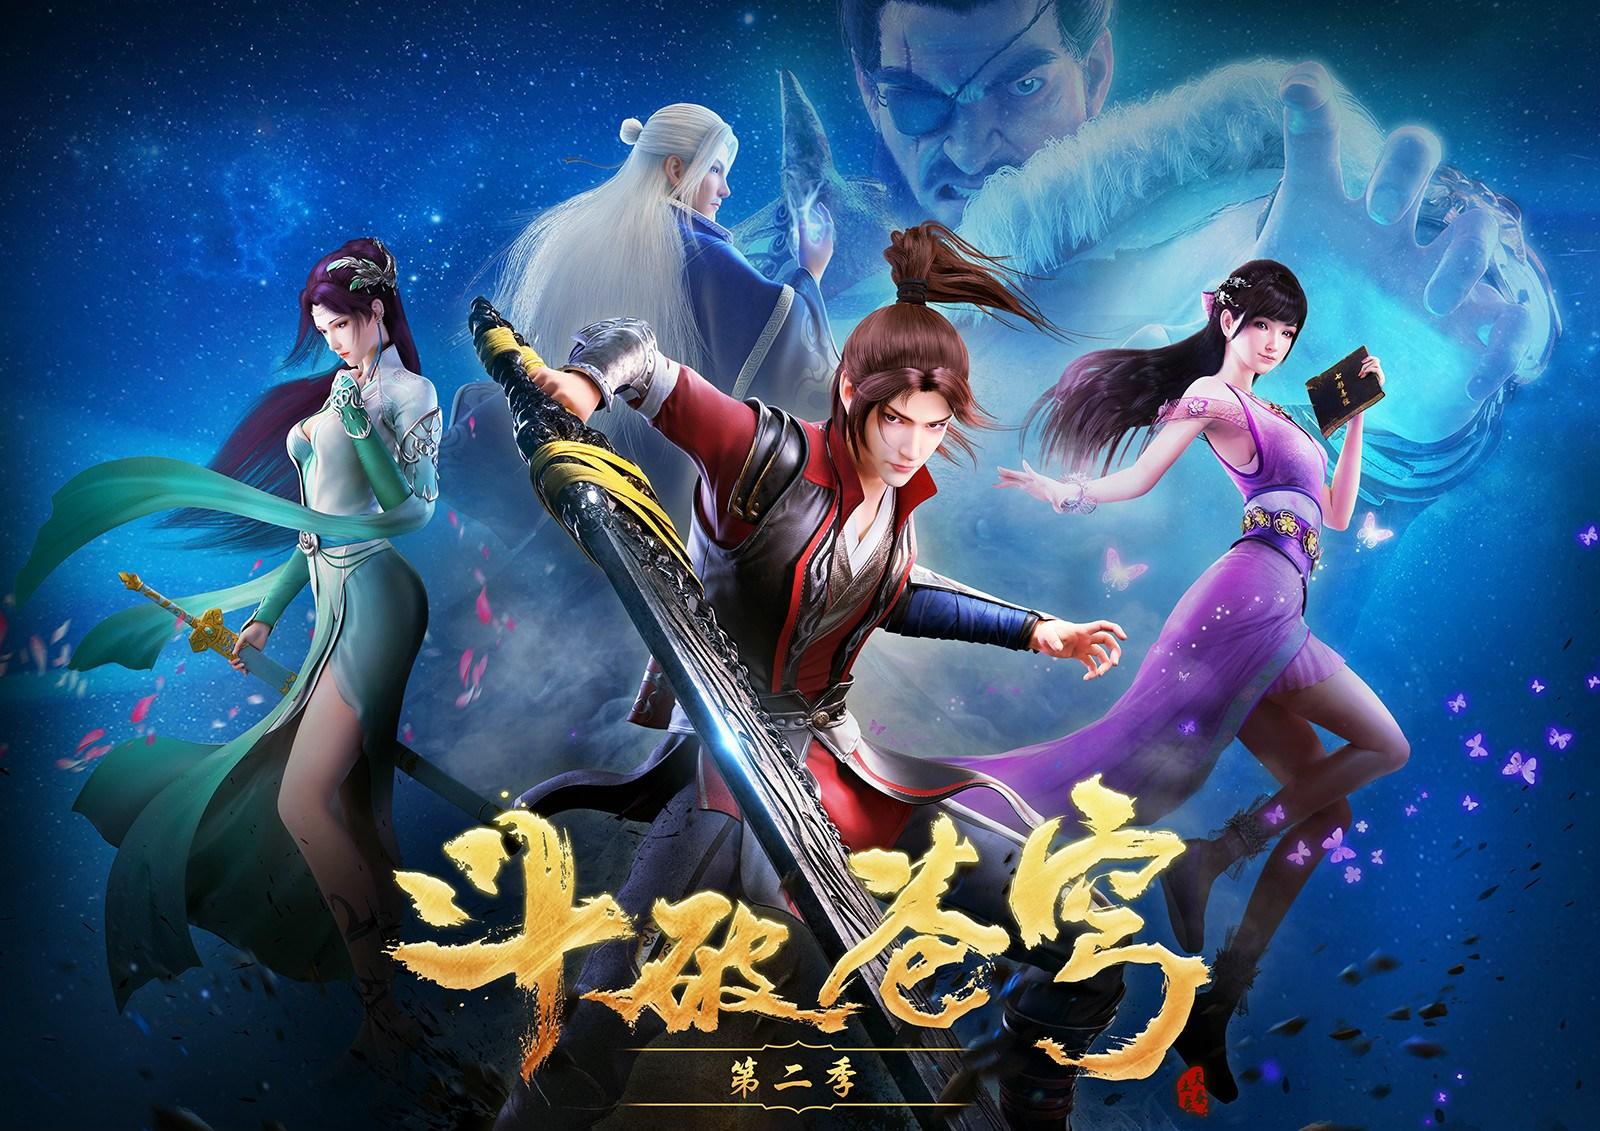 Battle Through the Heavens Season 3 Batch Subtitle Indonesia